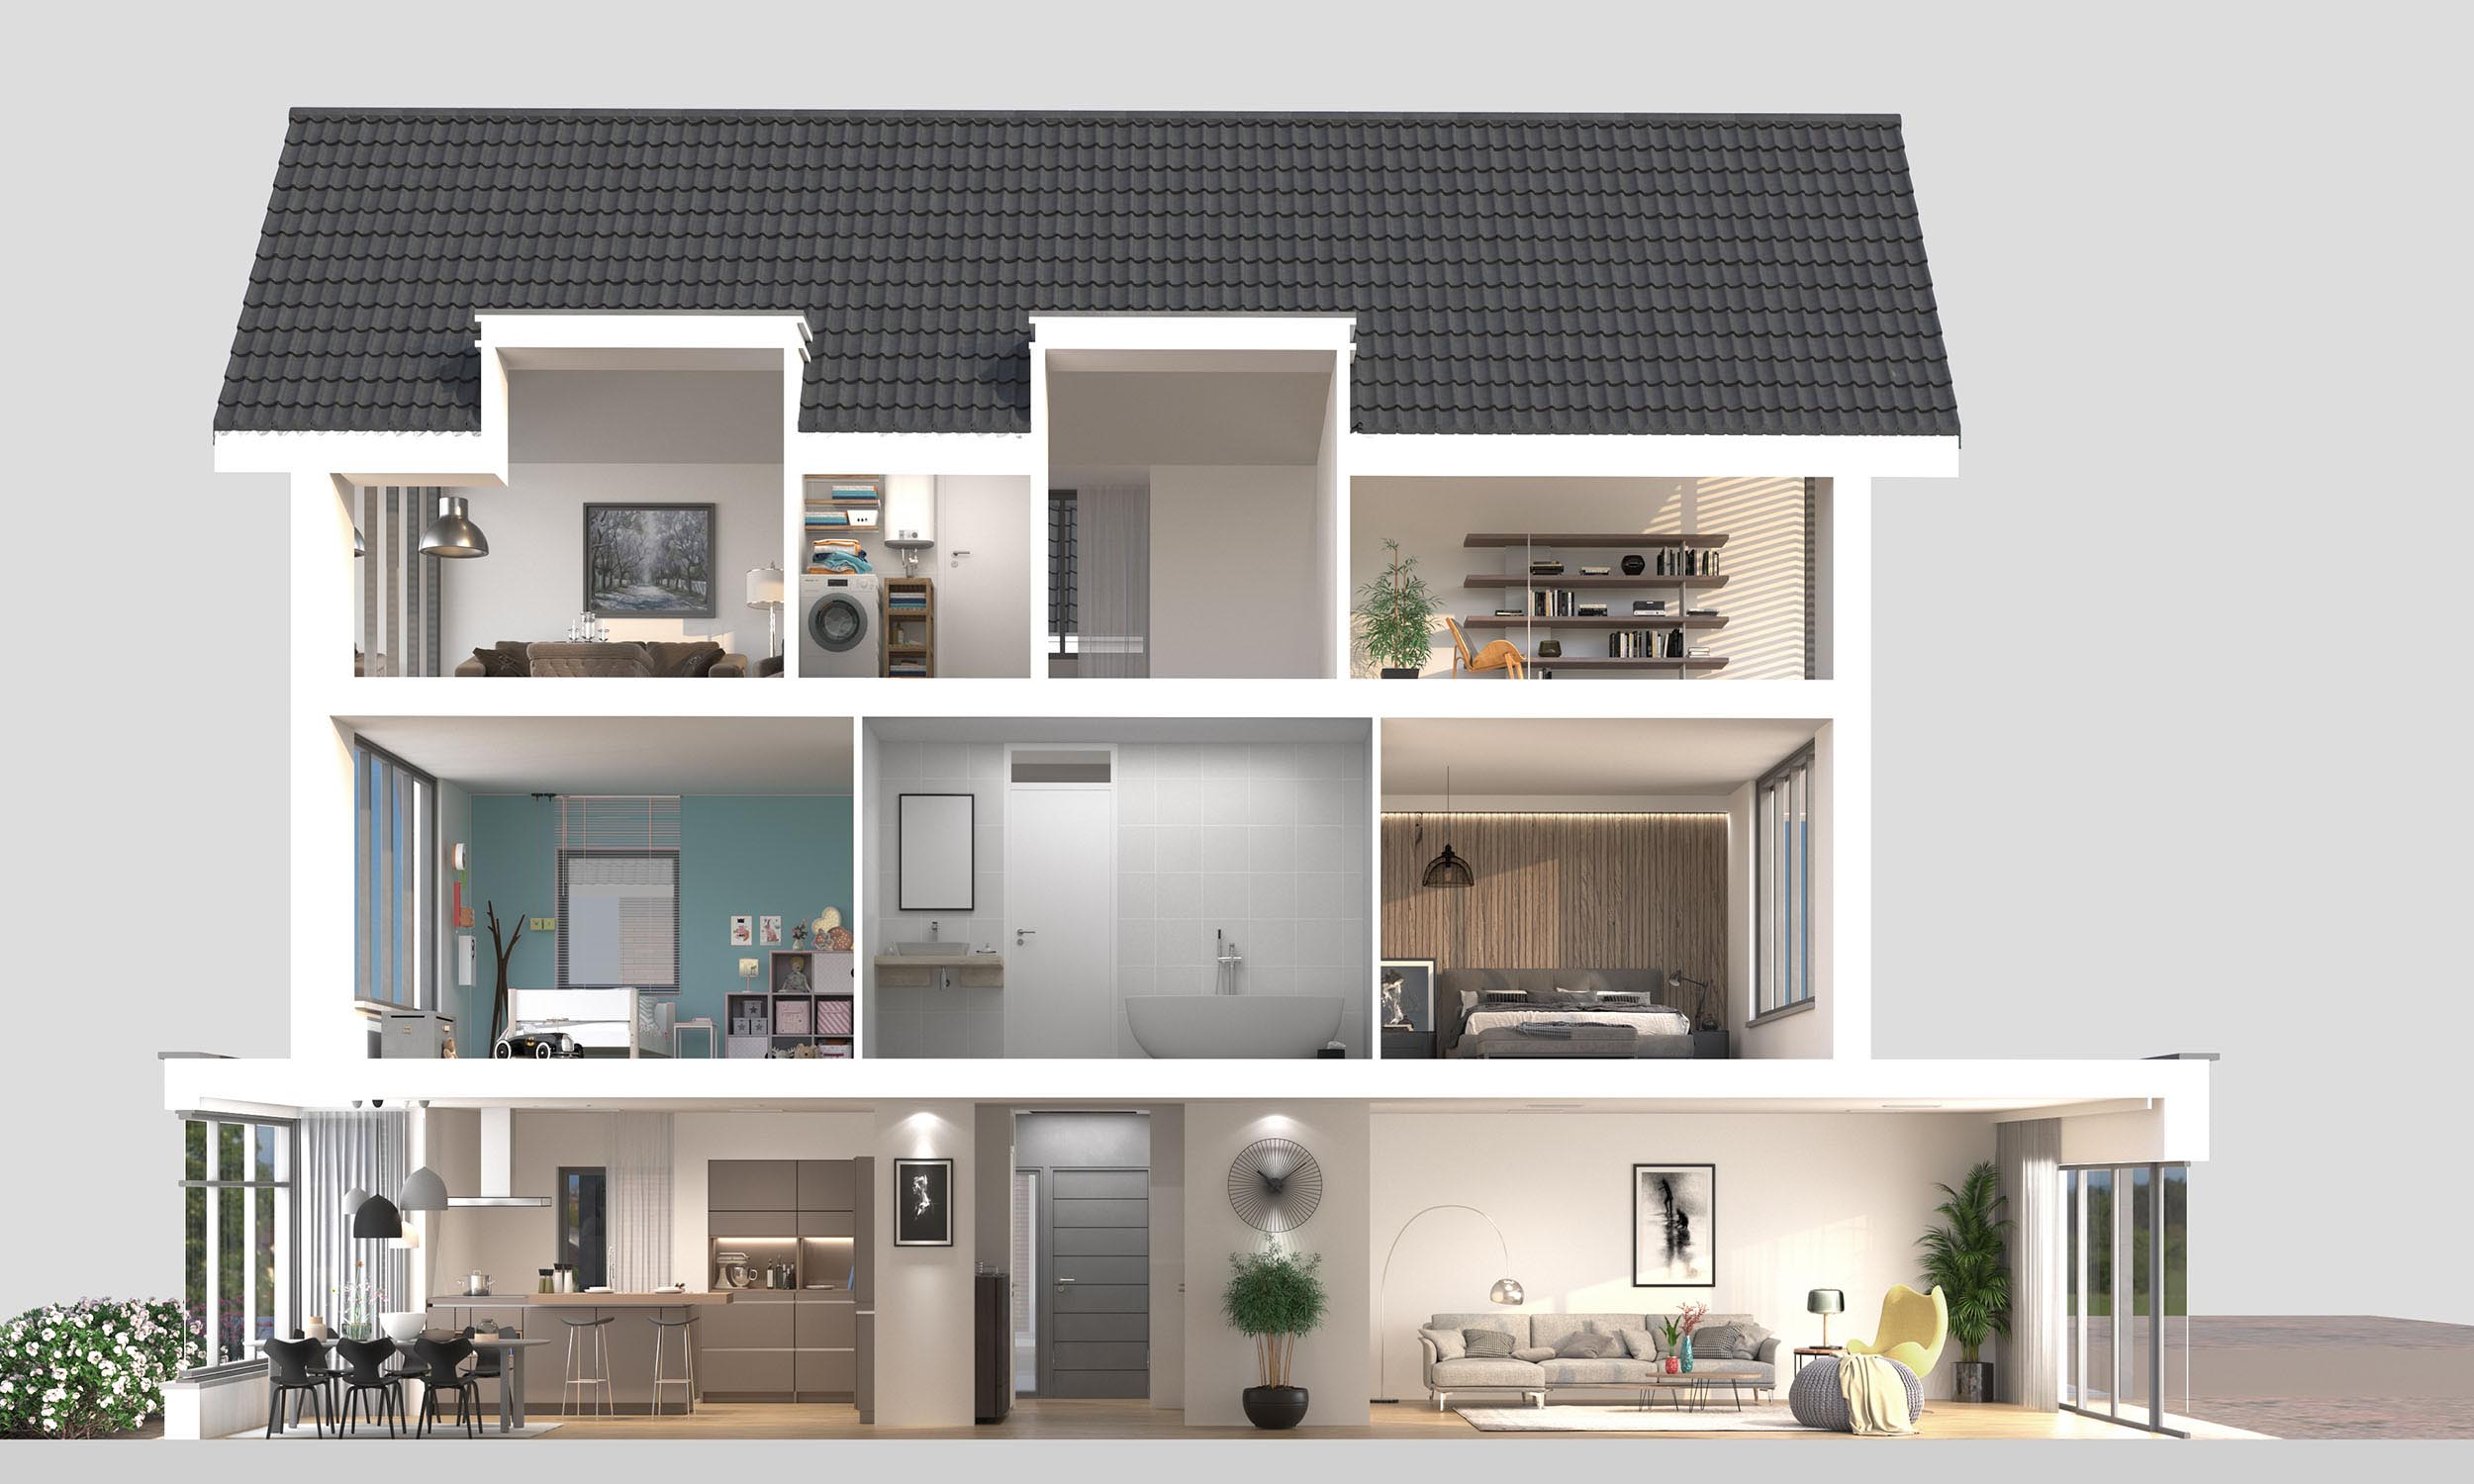 2d 3d Floorplans Dreamvisuals 3d Visualisatie Artist Impressions 3d Animatie